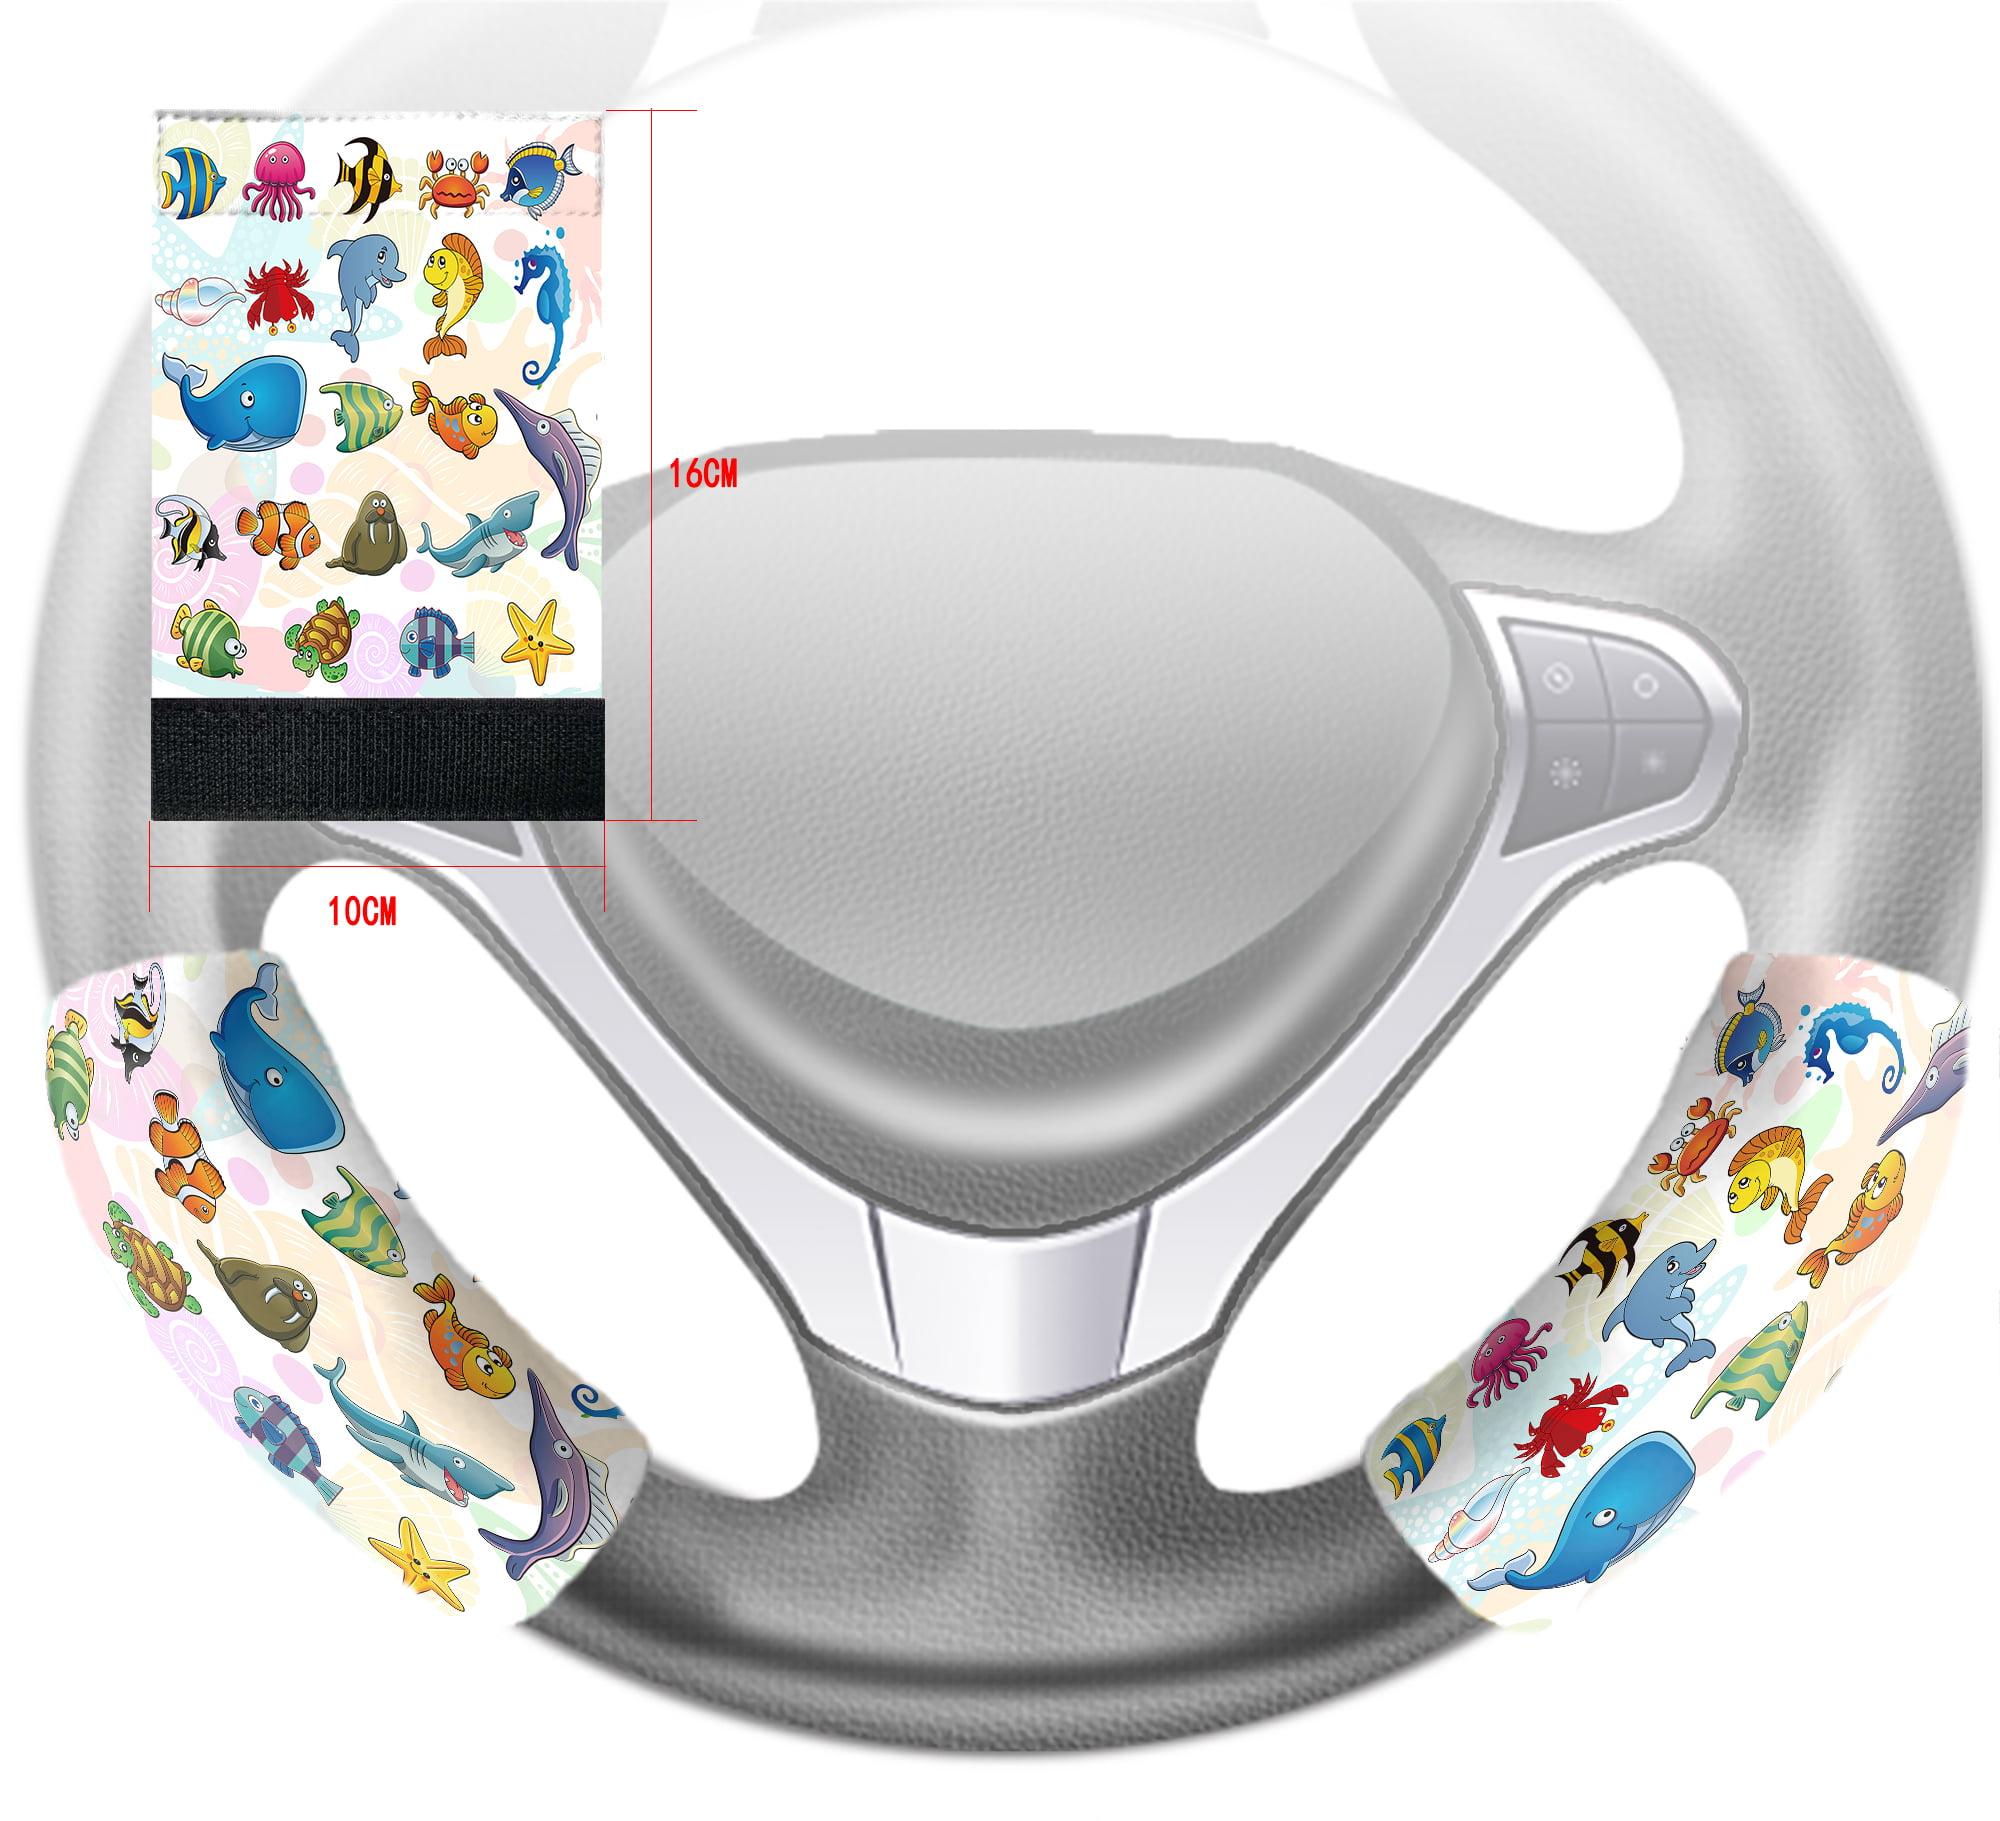 Shop Amazon.com | Steering wheel covers